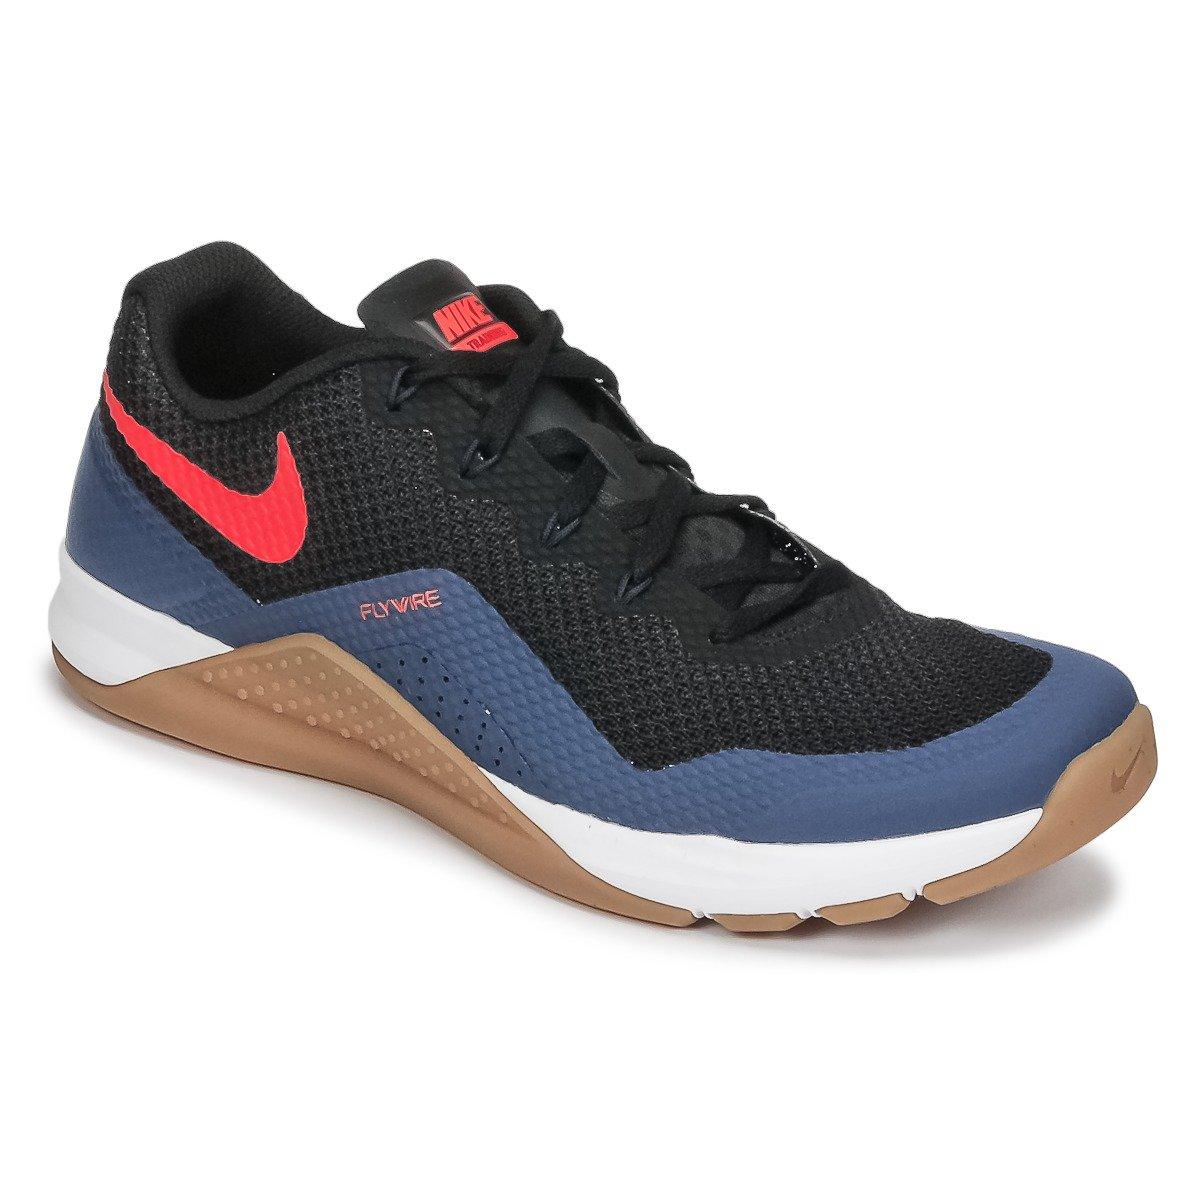 Nike Metcon Repper DSX Cross-Training, Zapatillas de Deporte para Hombre 44 EU Multicolor (Black/Hyper Crimson/084)